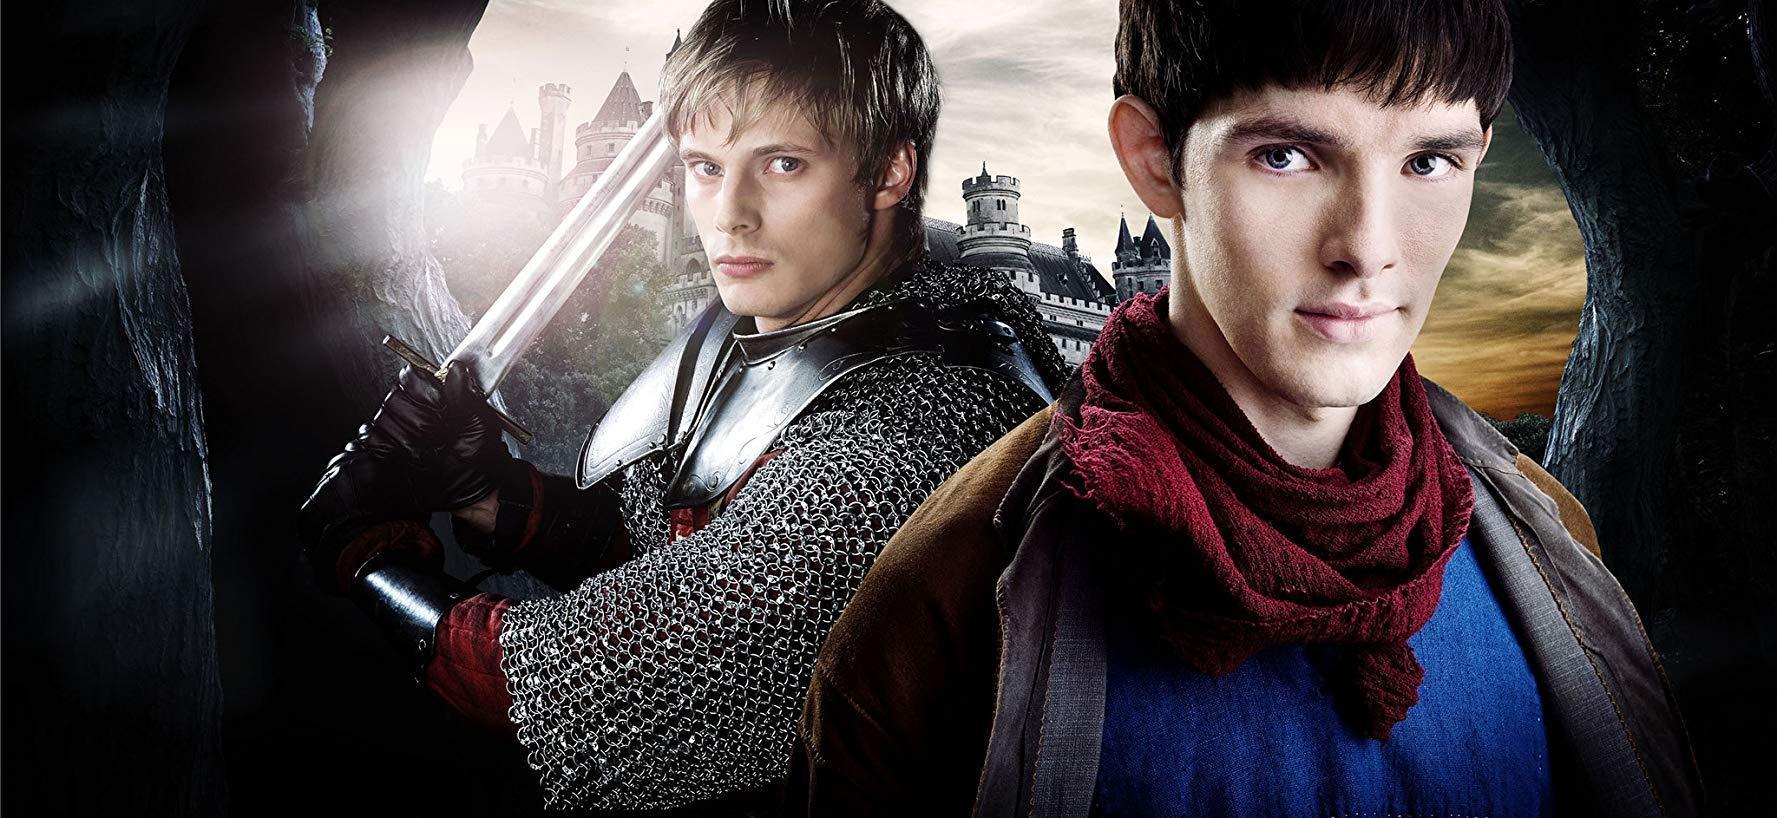 Promotiefoto_Merlin_imdb